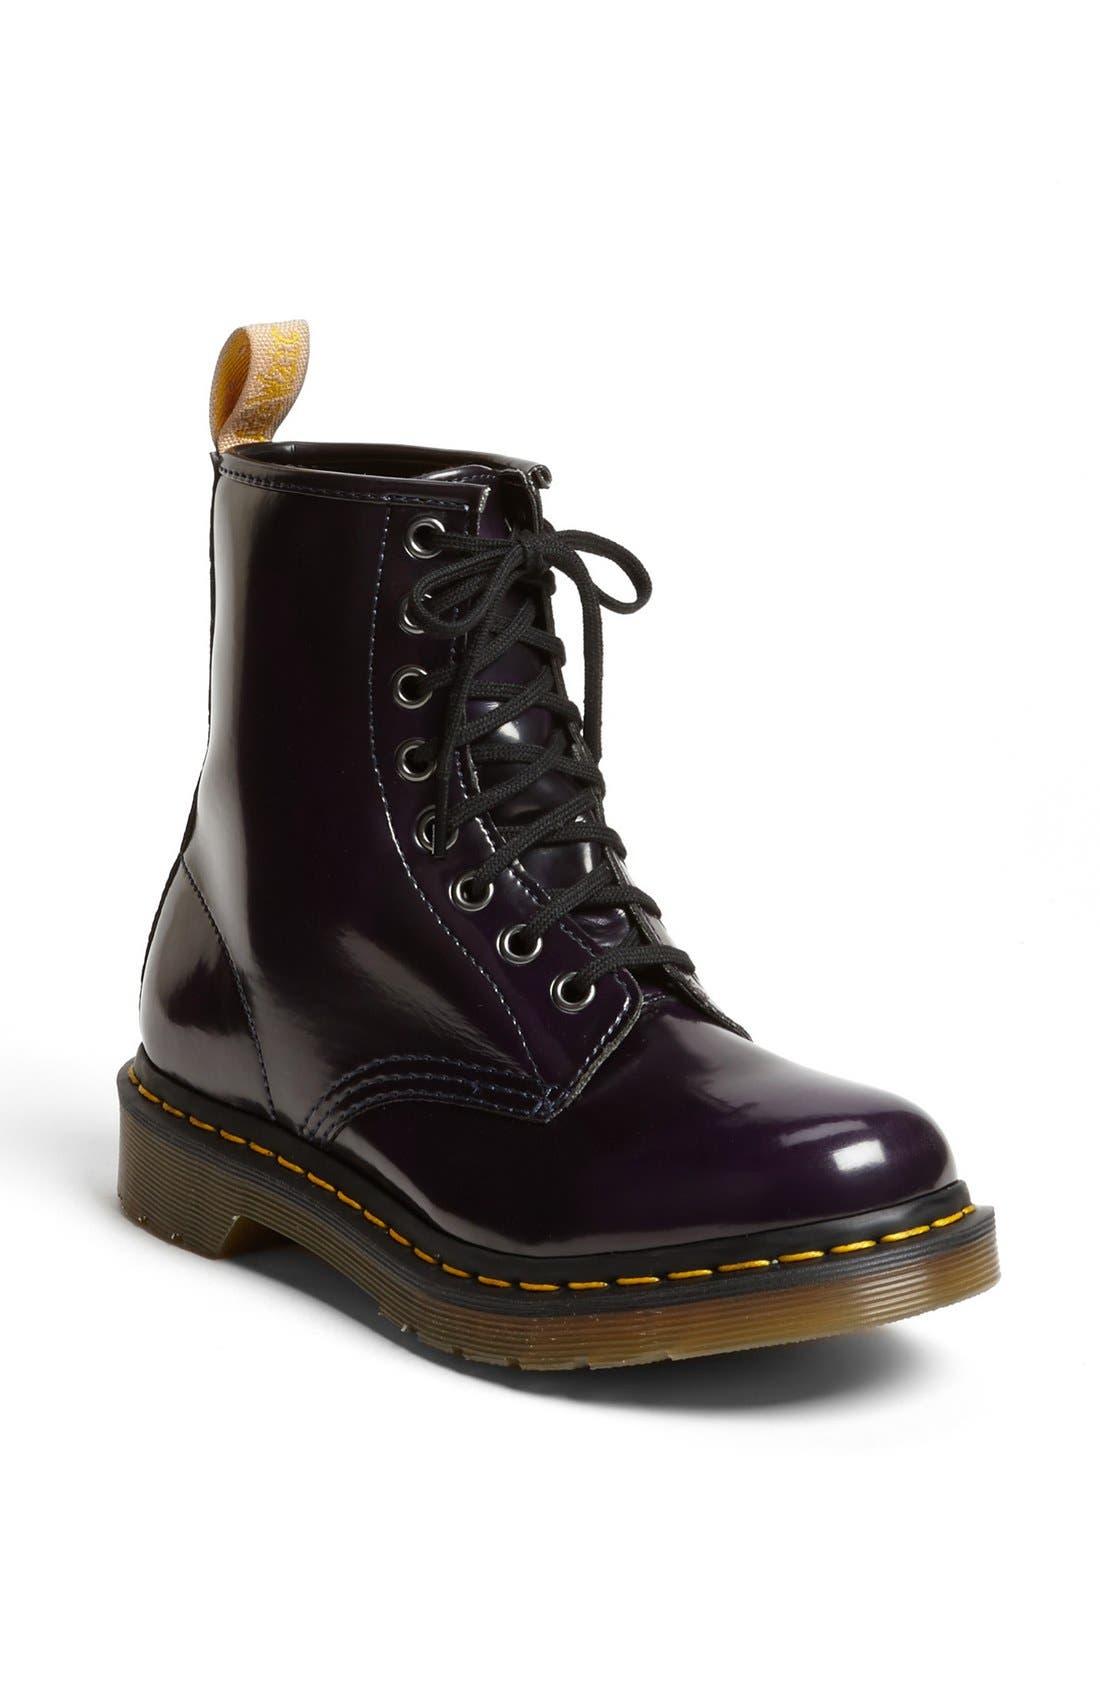 Alternate Image 1 Selected - Dr. Martens 'Vegan 1460' Boot